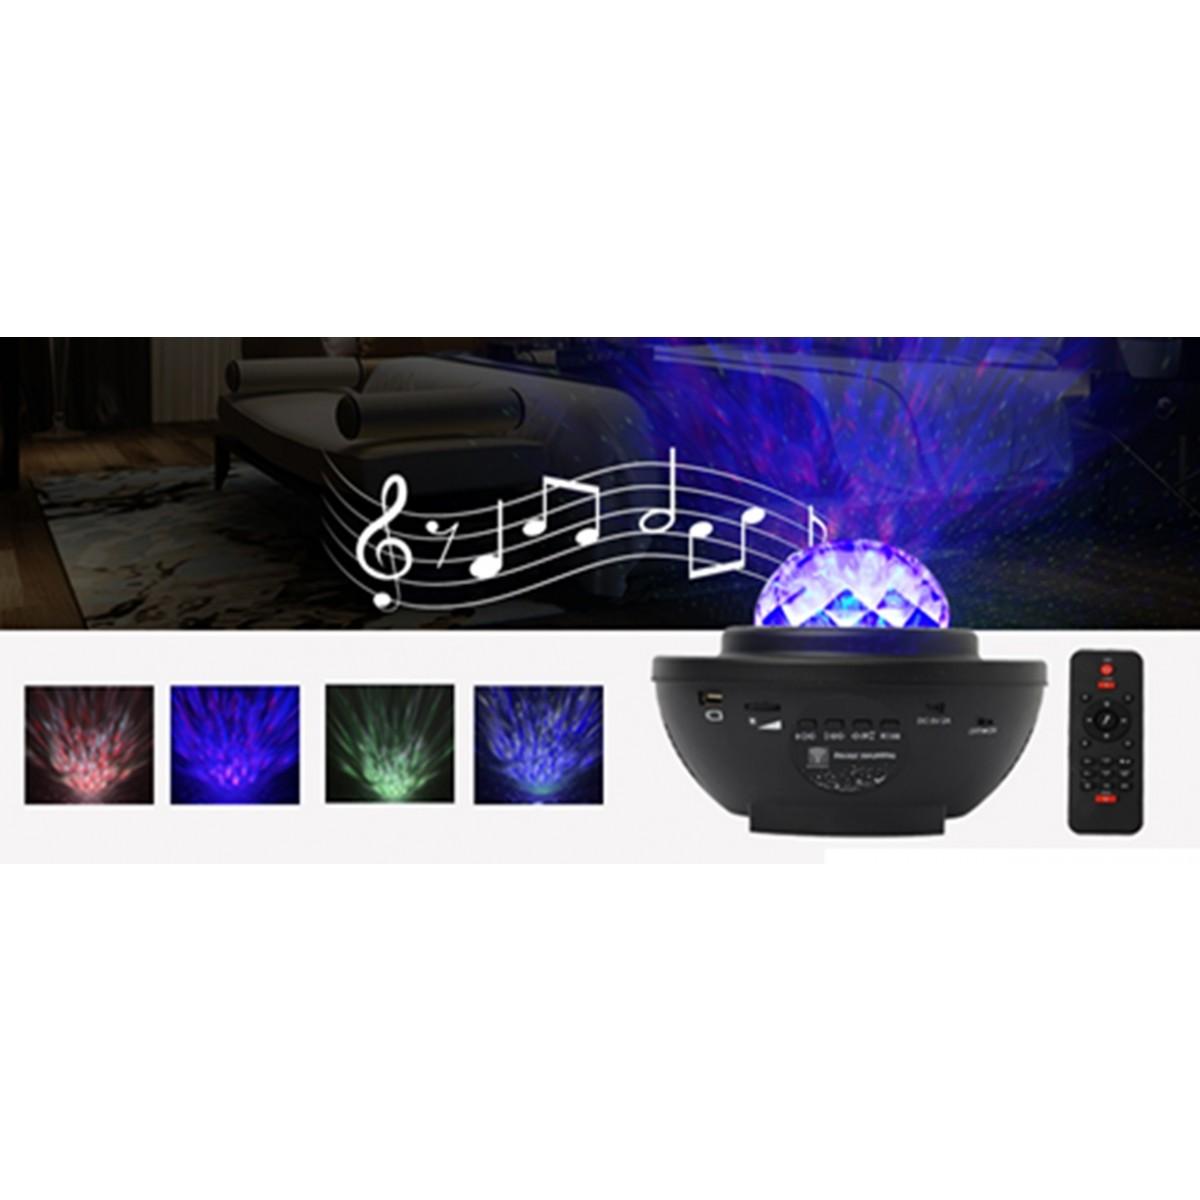 CONZEPT Stjerne projektorlampe m/ bluetooth